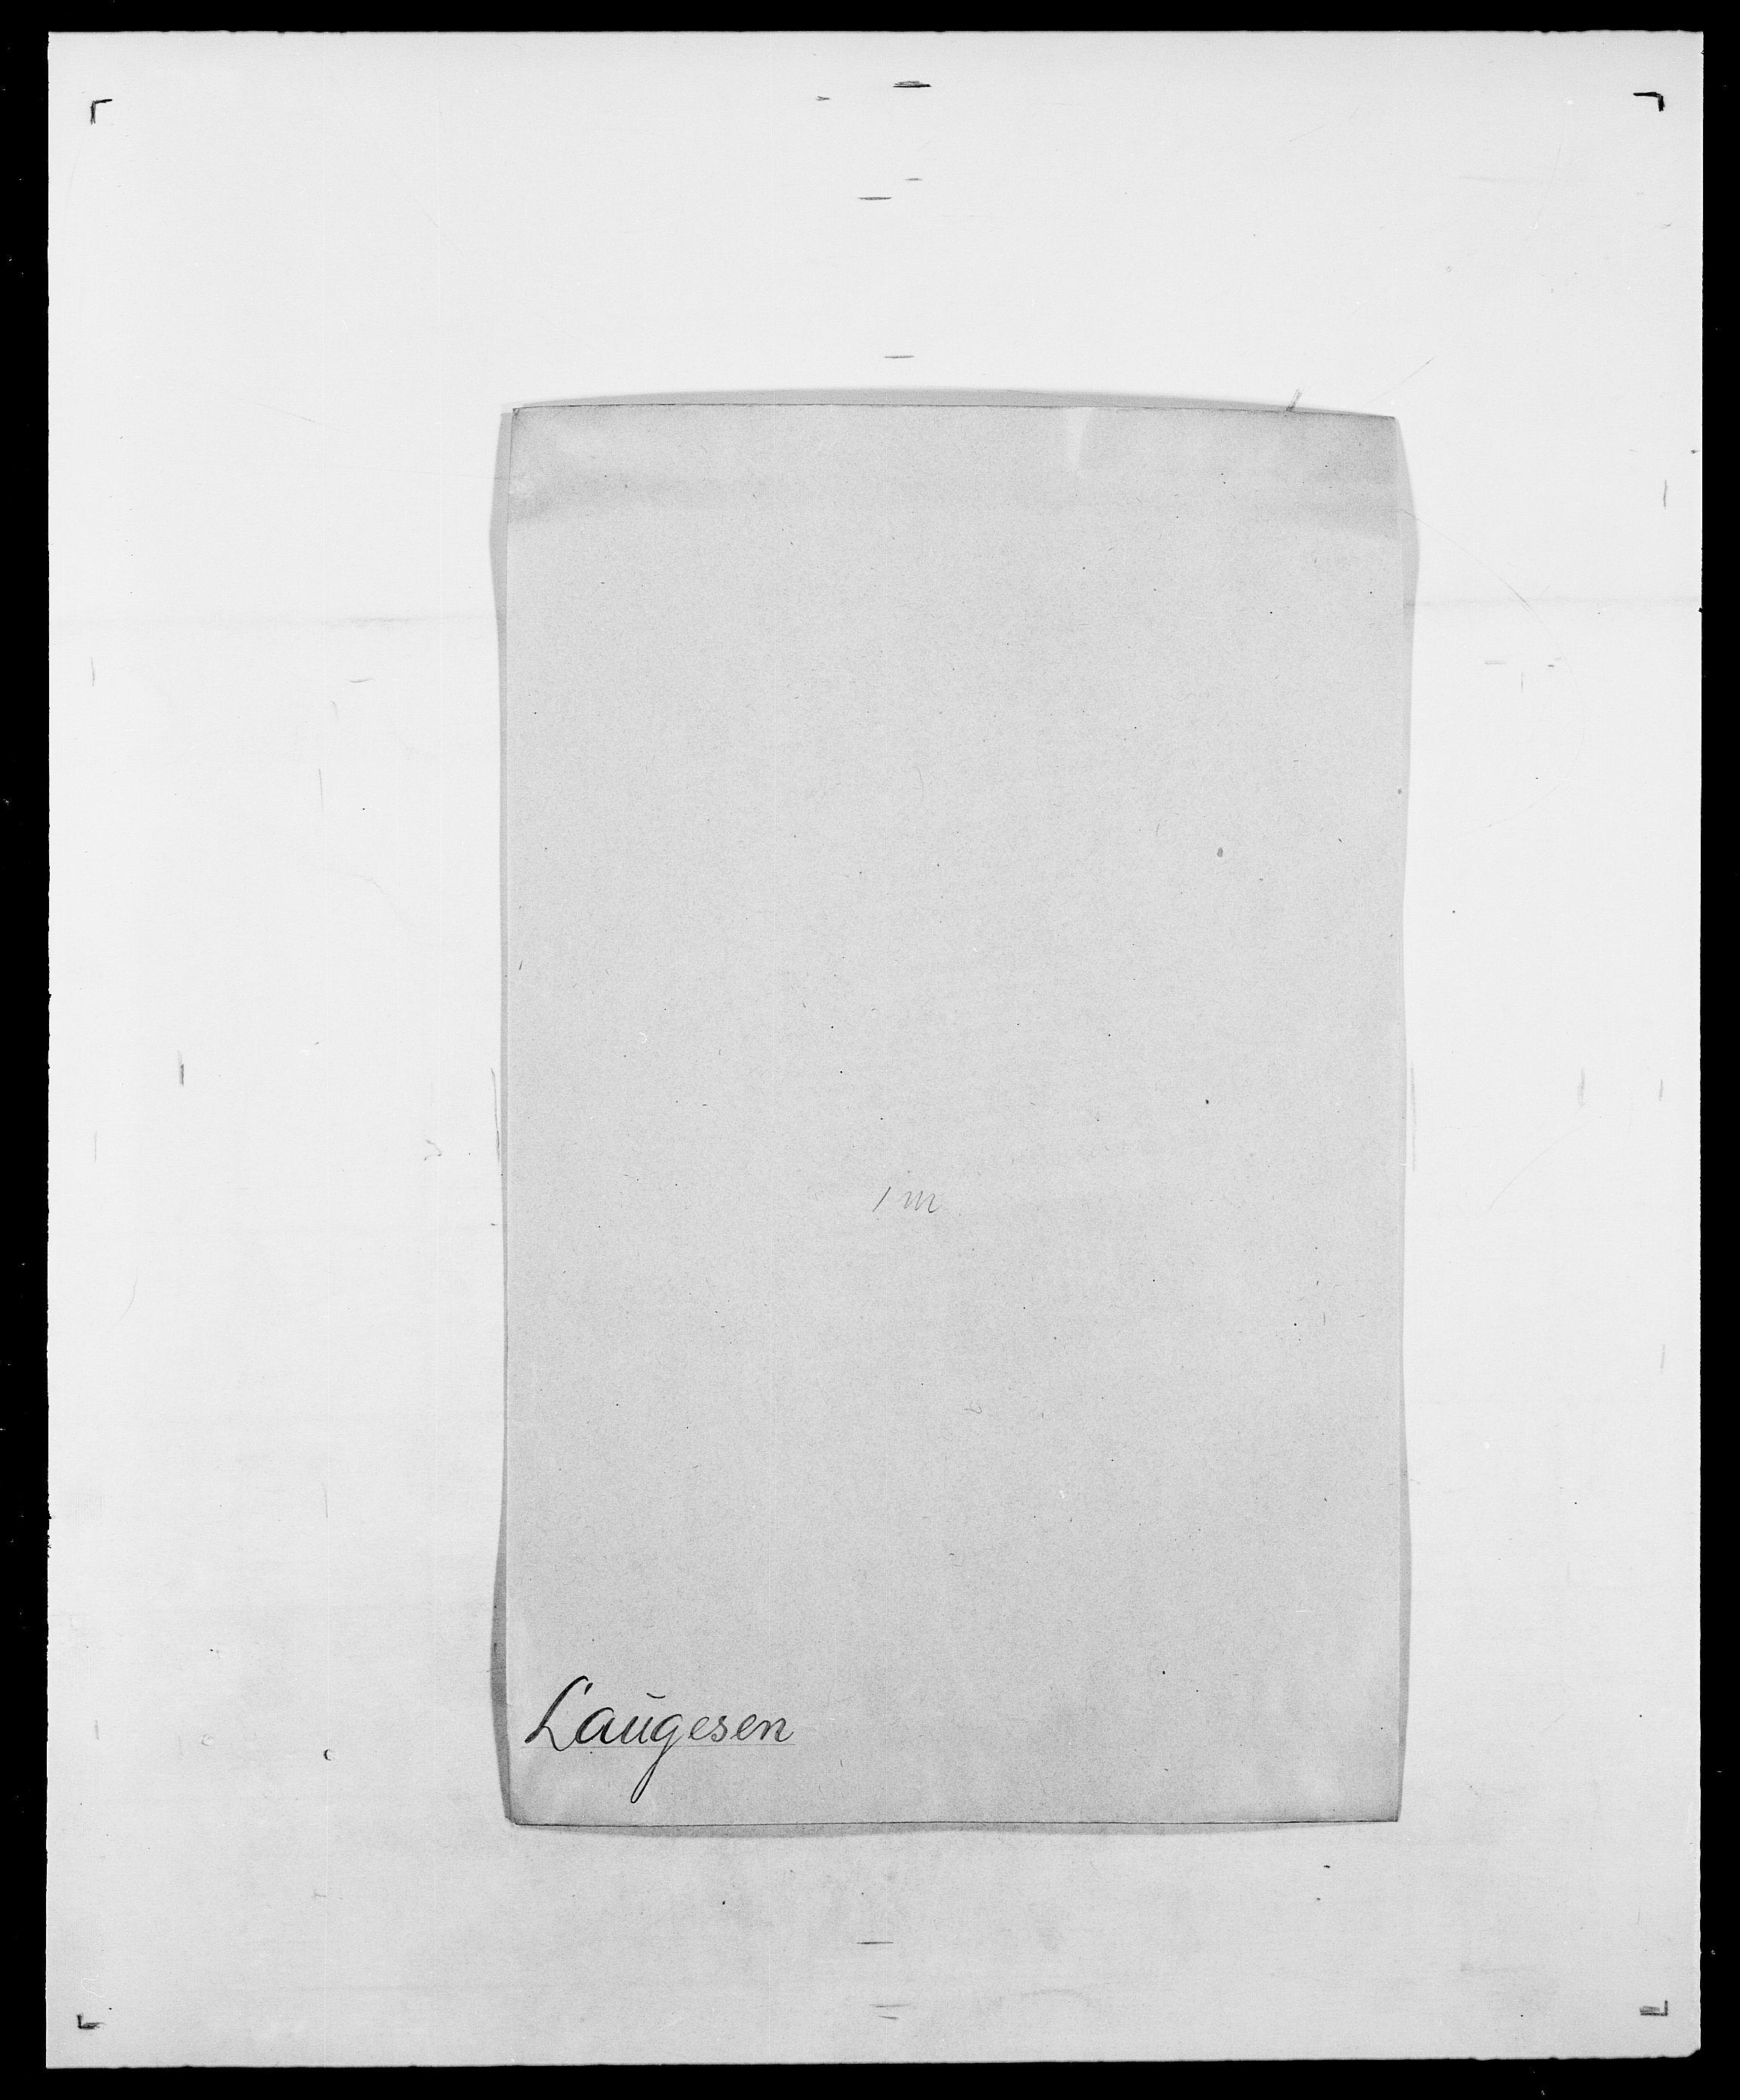 SAO, Delgobe, Charles Antoine - samling, D/Da/L0023: Lau - Lirvyn, s. 8